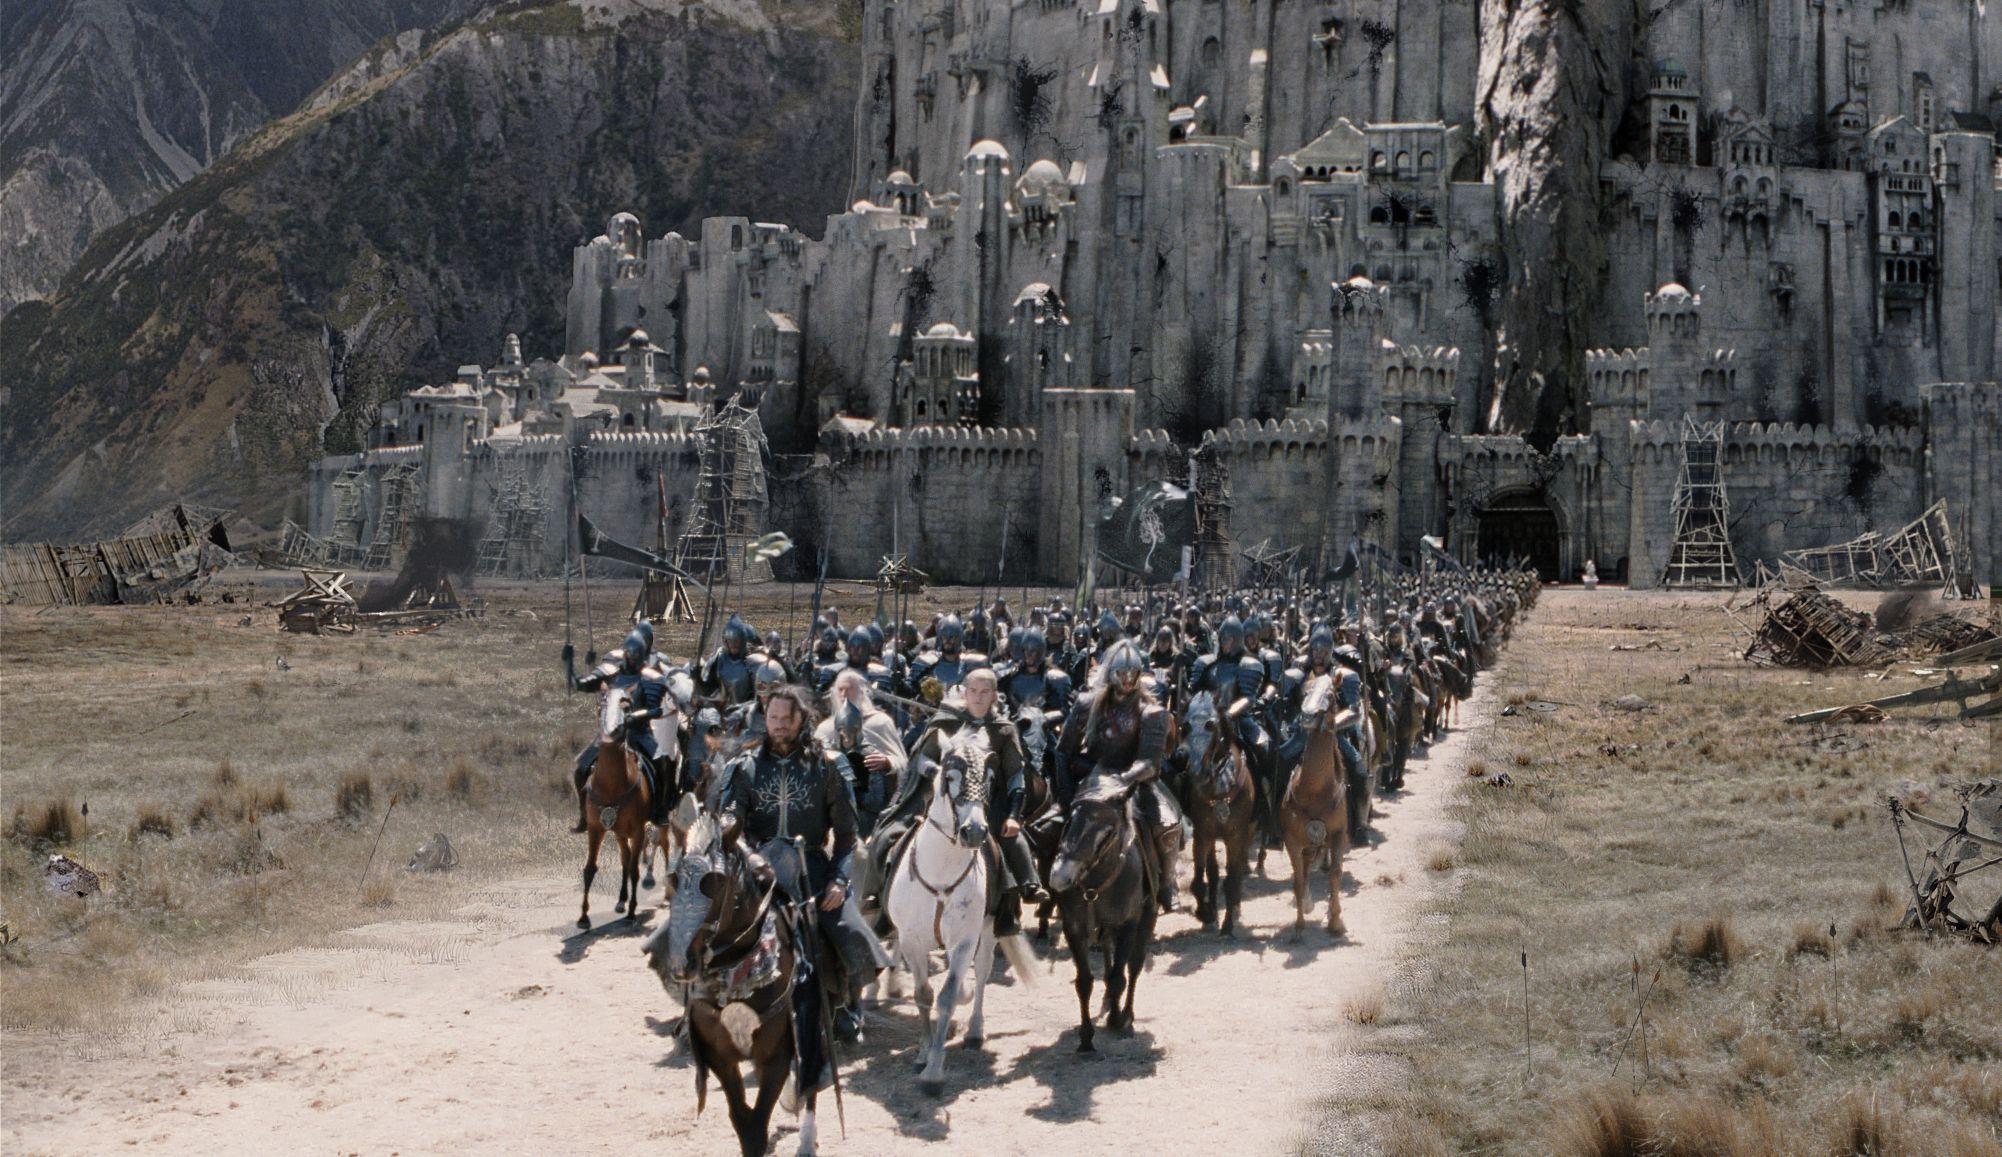 Top 250 фильмов IMDb Властелин колец Возвращение короля (The Lord of the Rings The Return of the King) (2003)